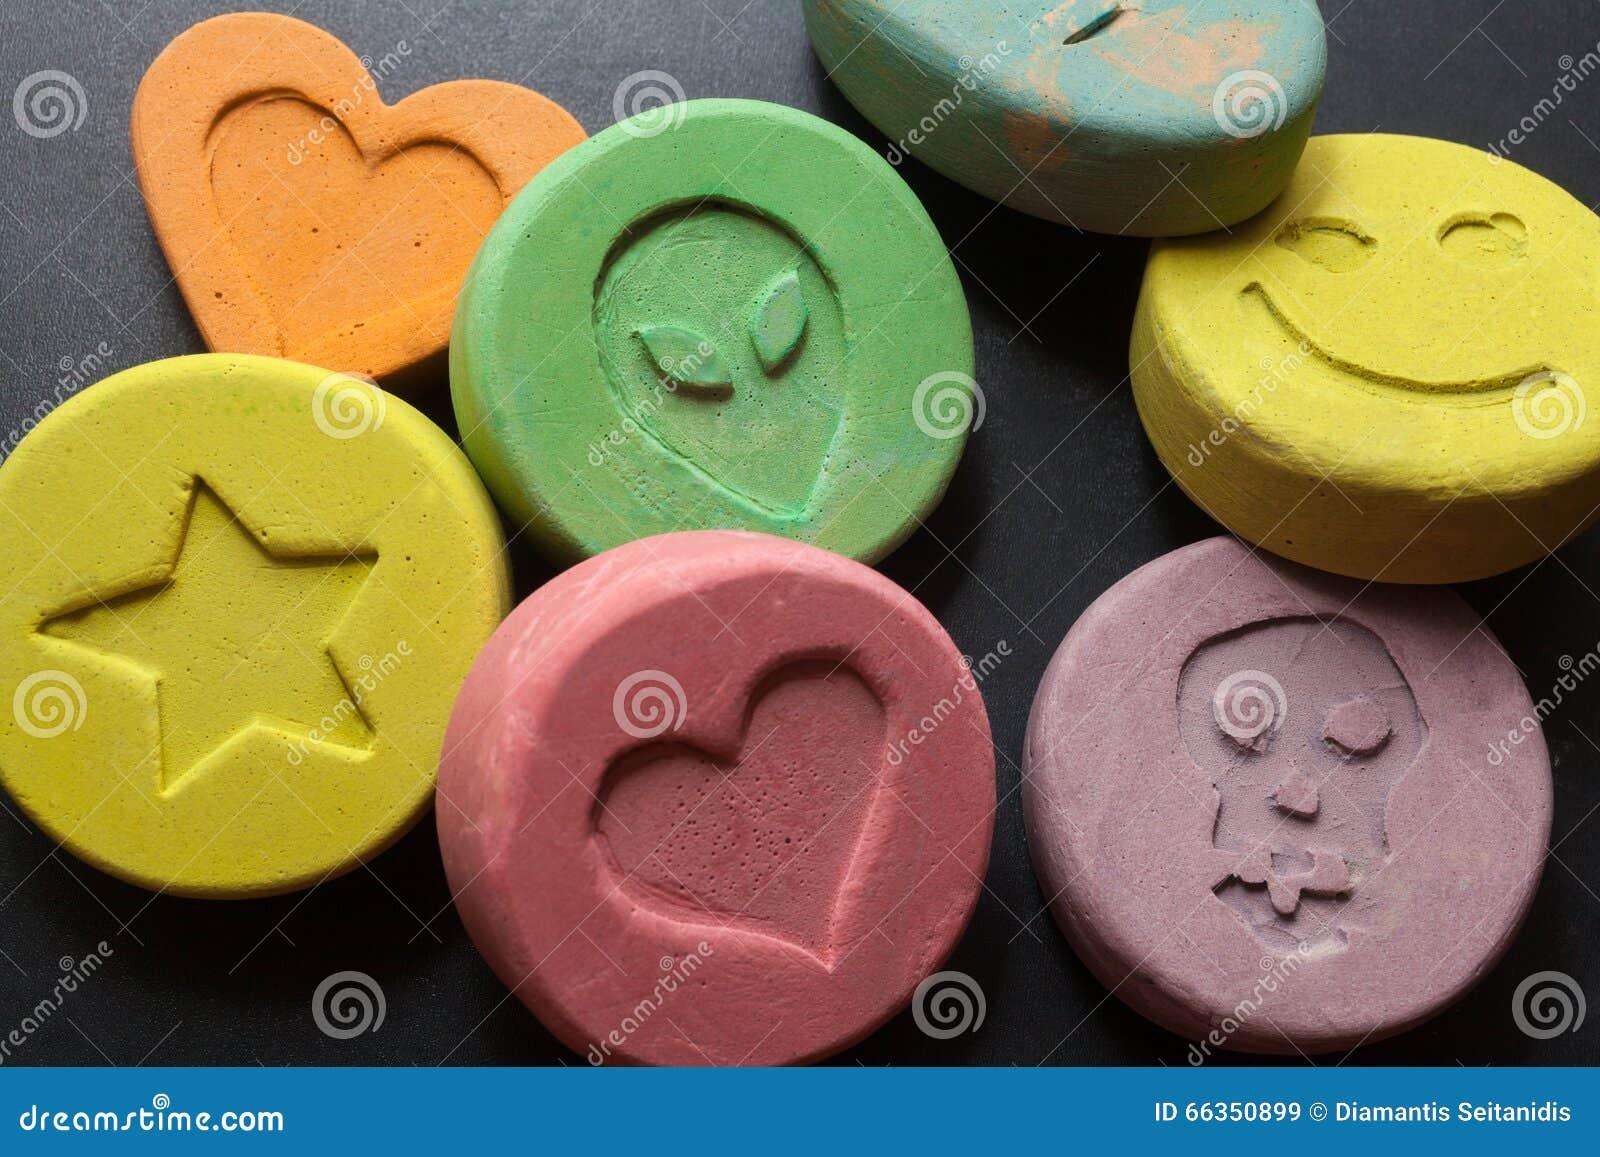 Extacy pills and viagra